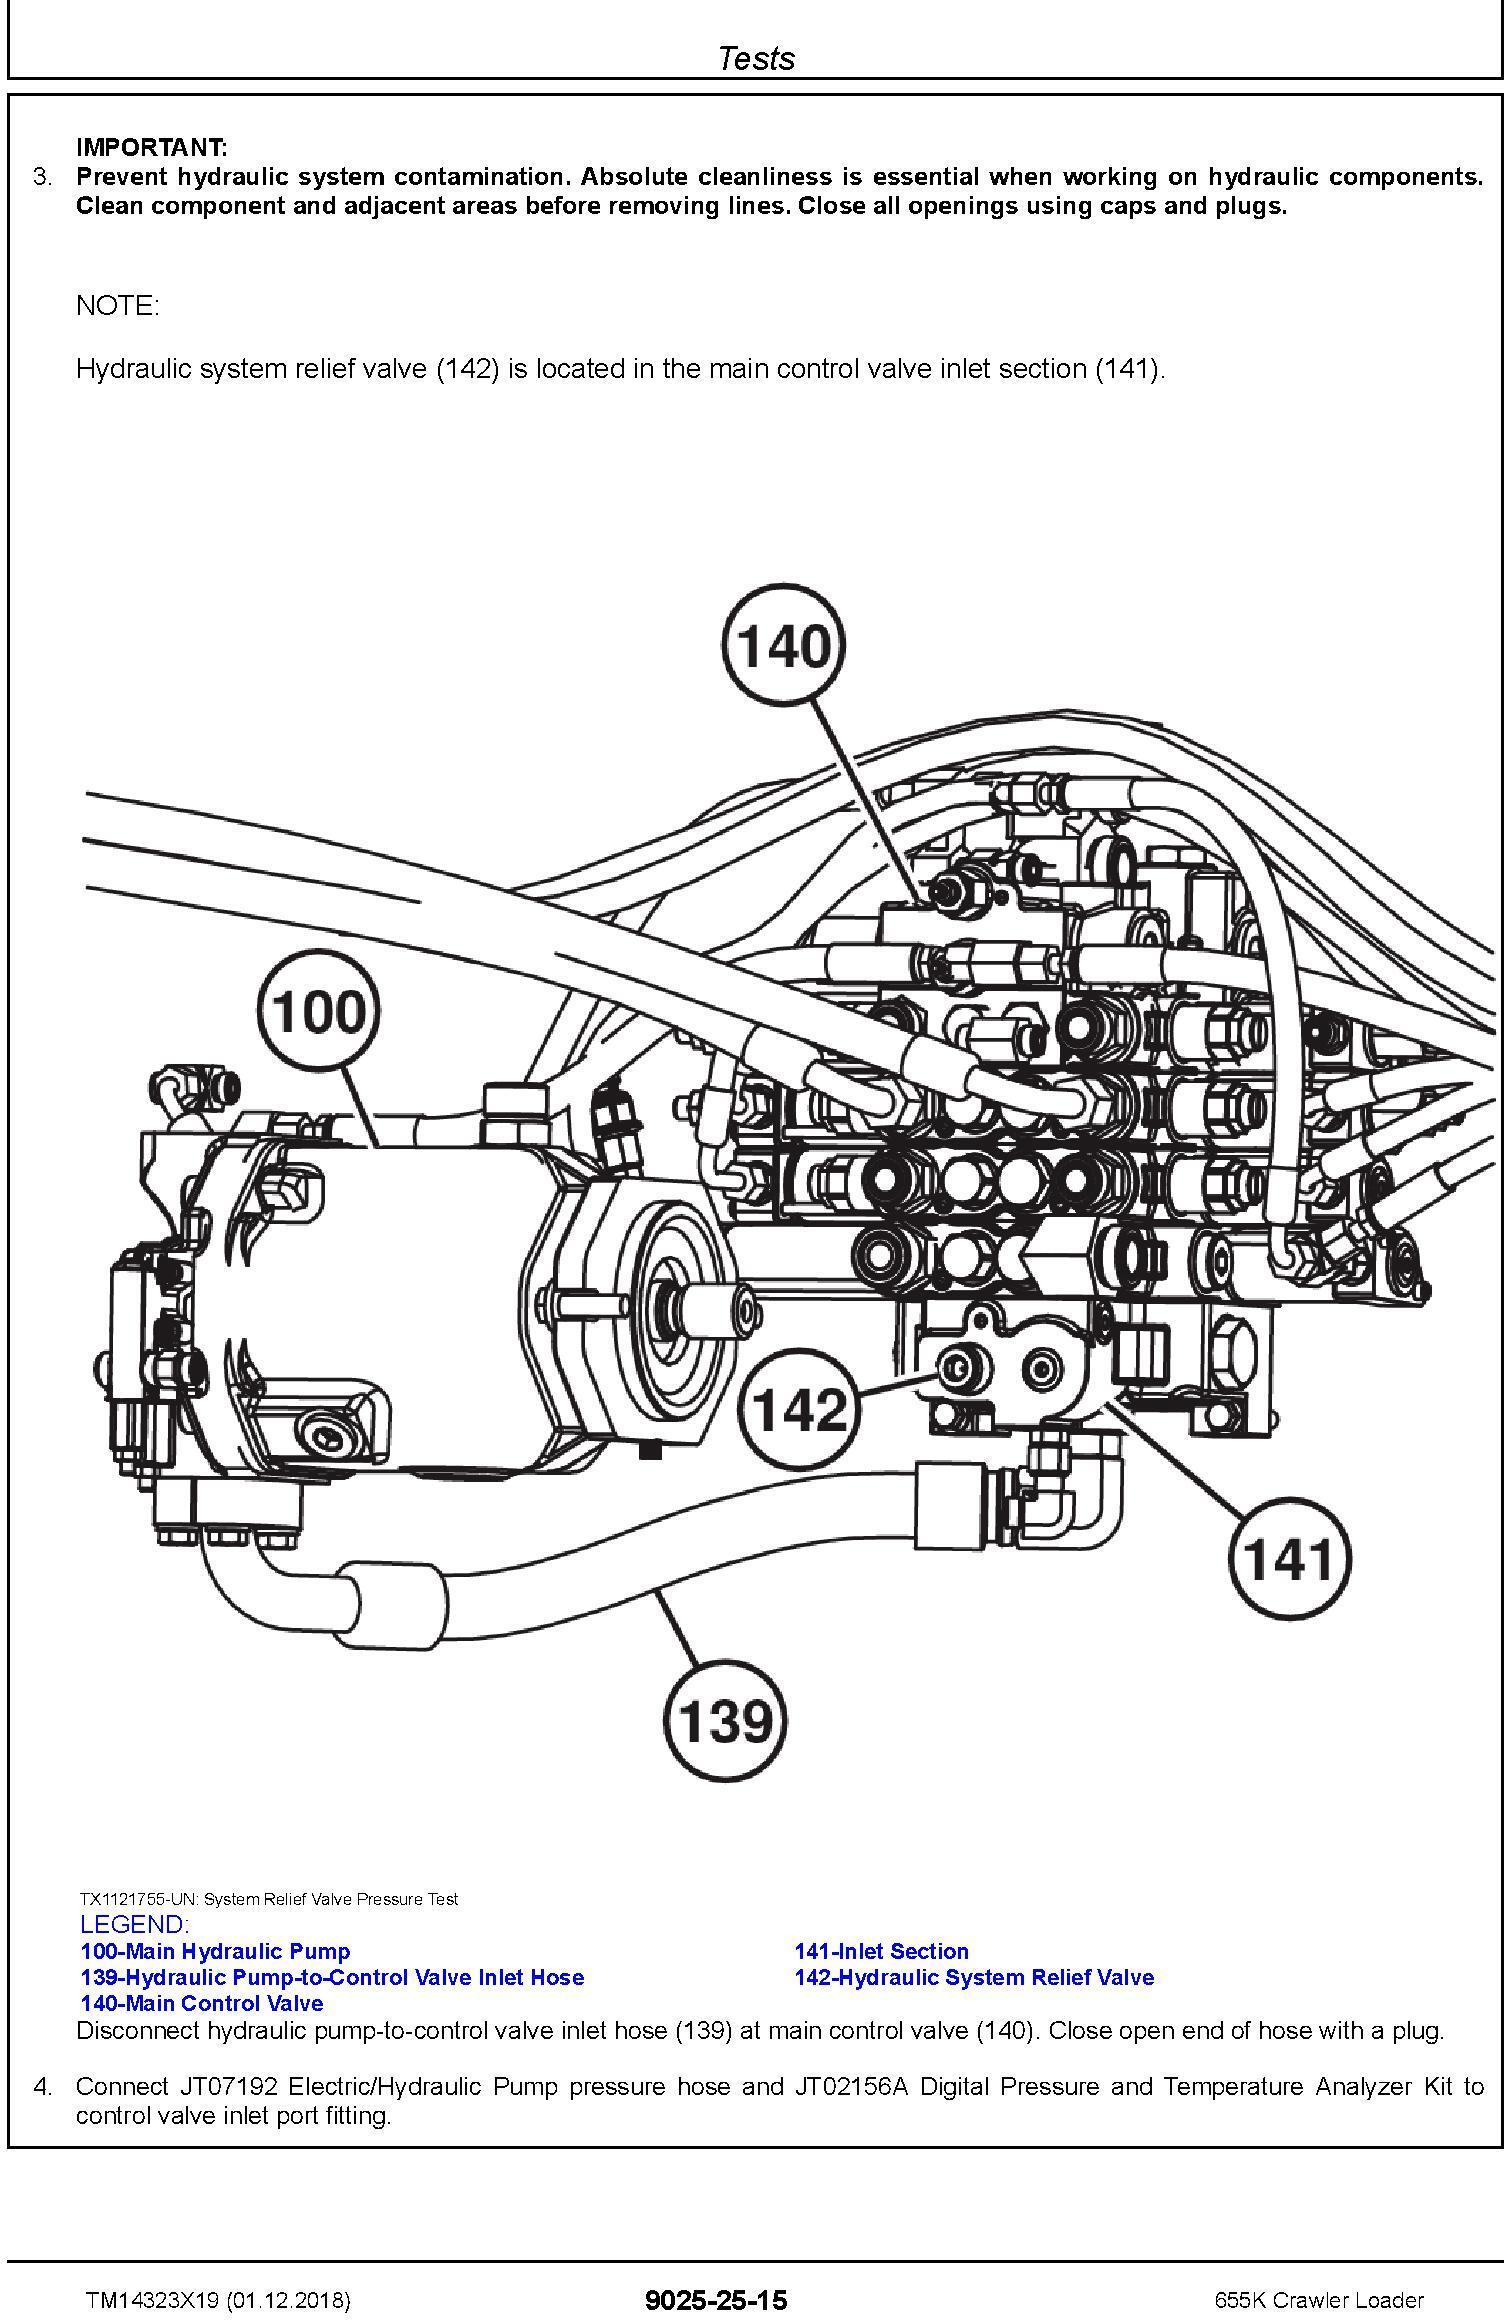 John Deere 655K Crawler Loader Operation & Test Technical Manual (TM14323X19) - 1